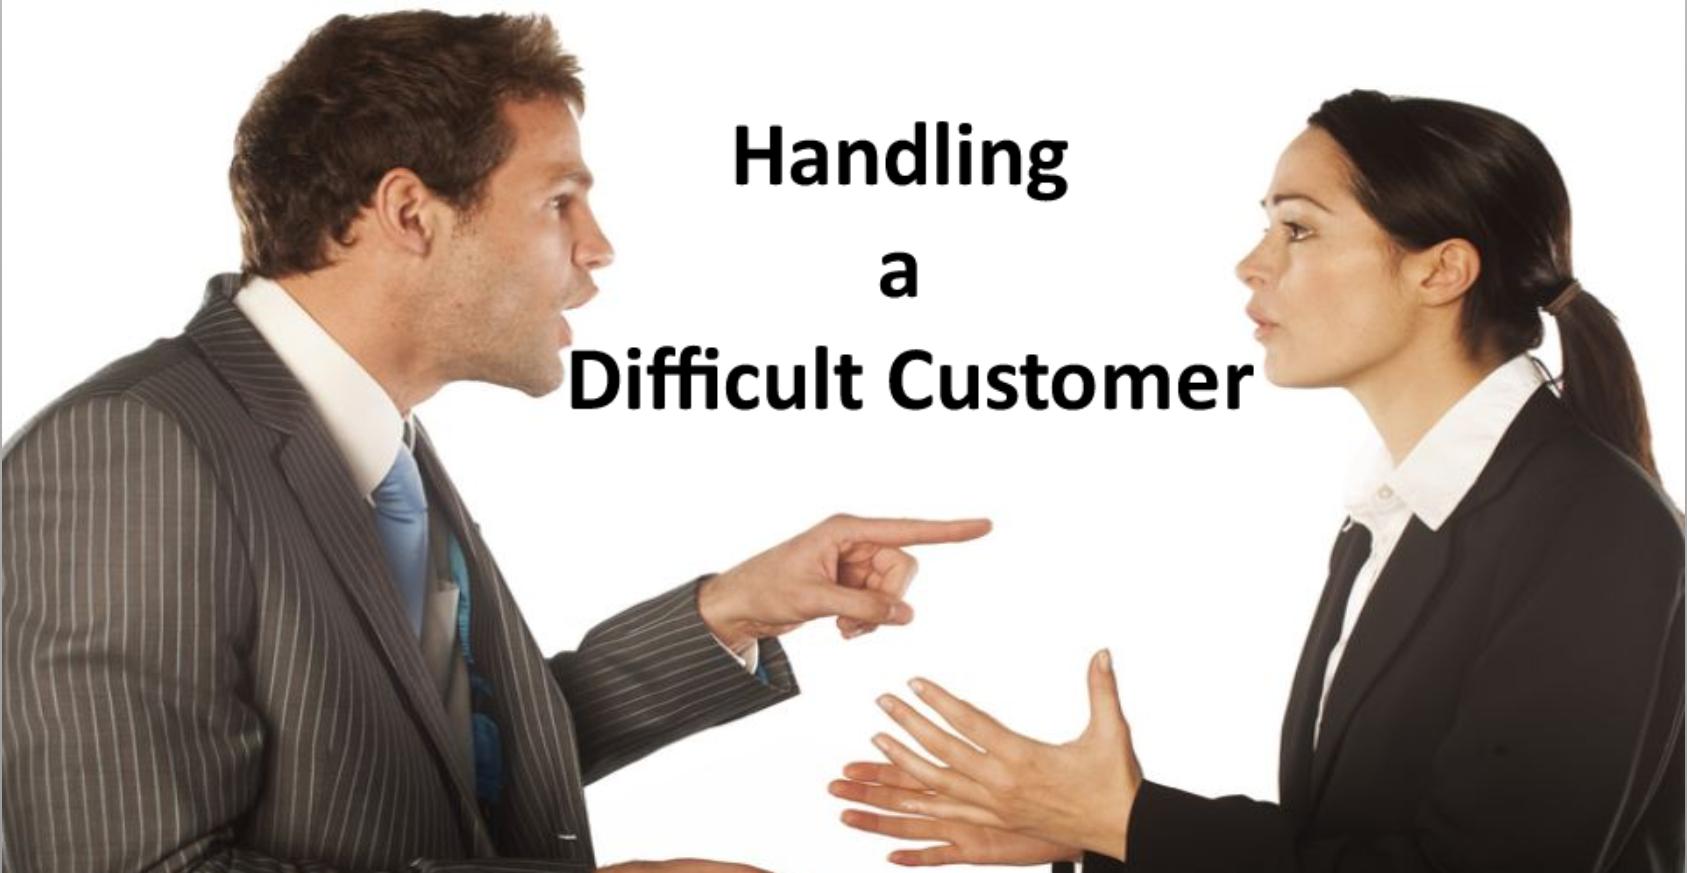 Handling a difficult Cust